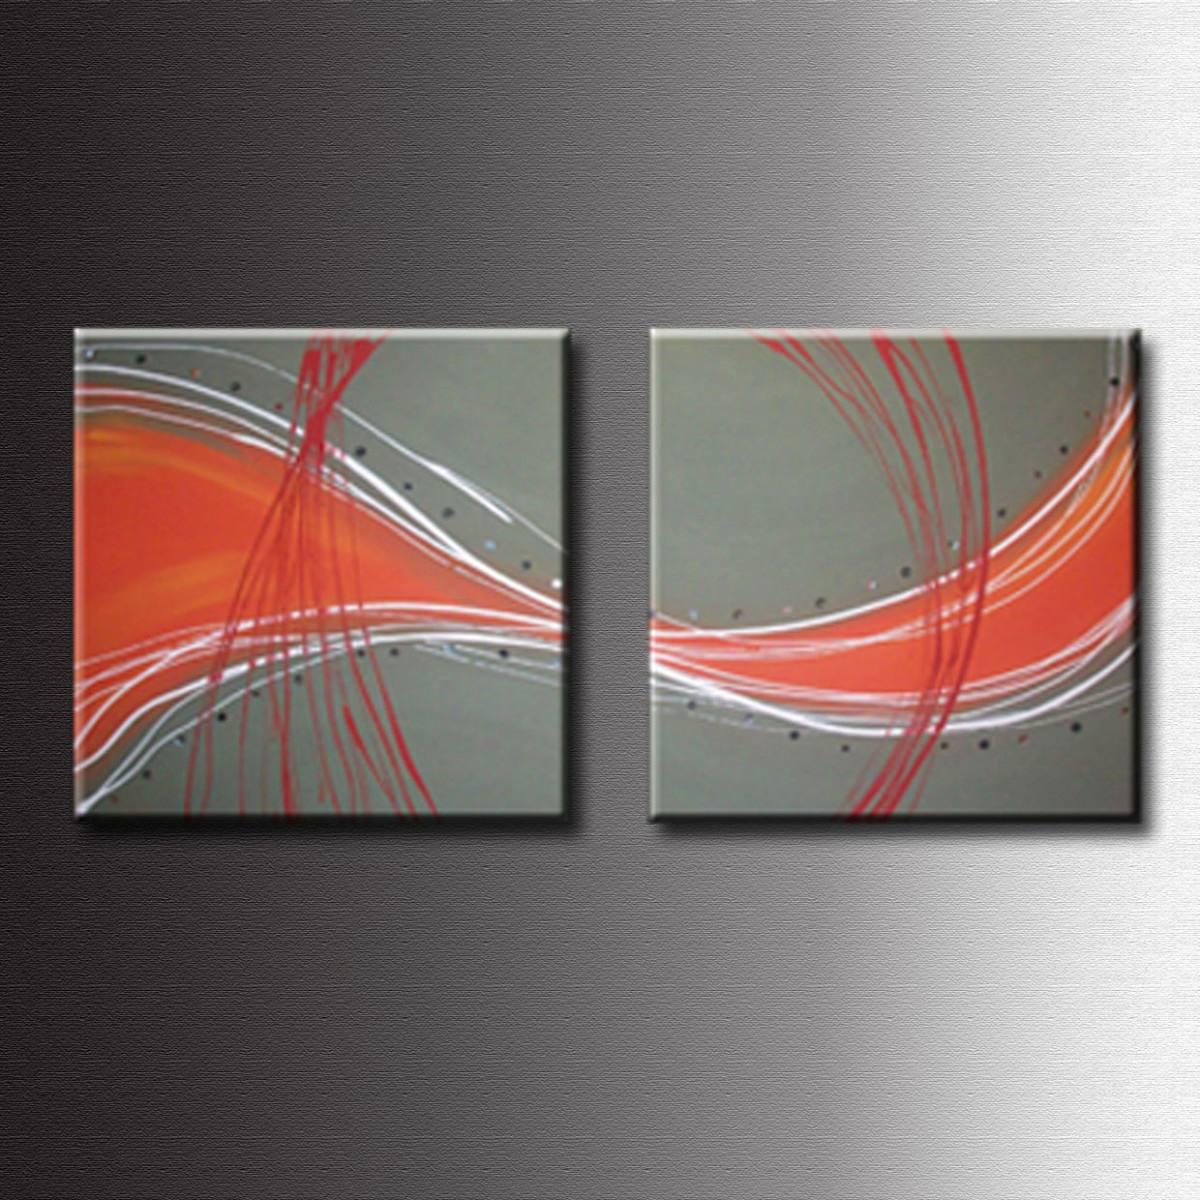 Cuadros Dipticos Modernos Cuadros Modernos Dipticos Tripticos